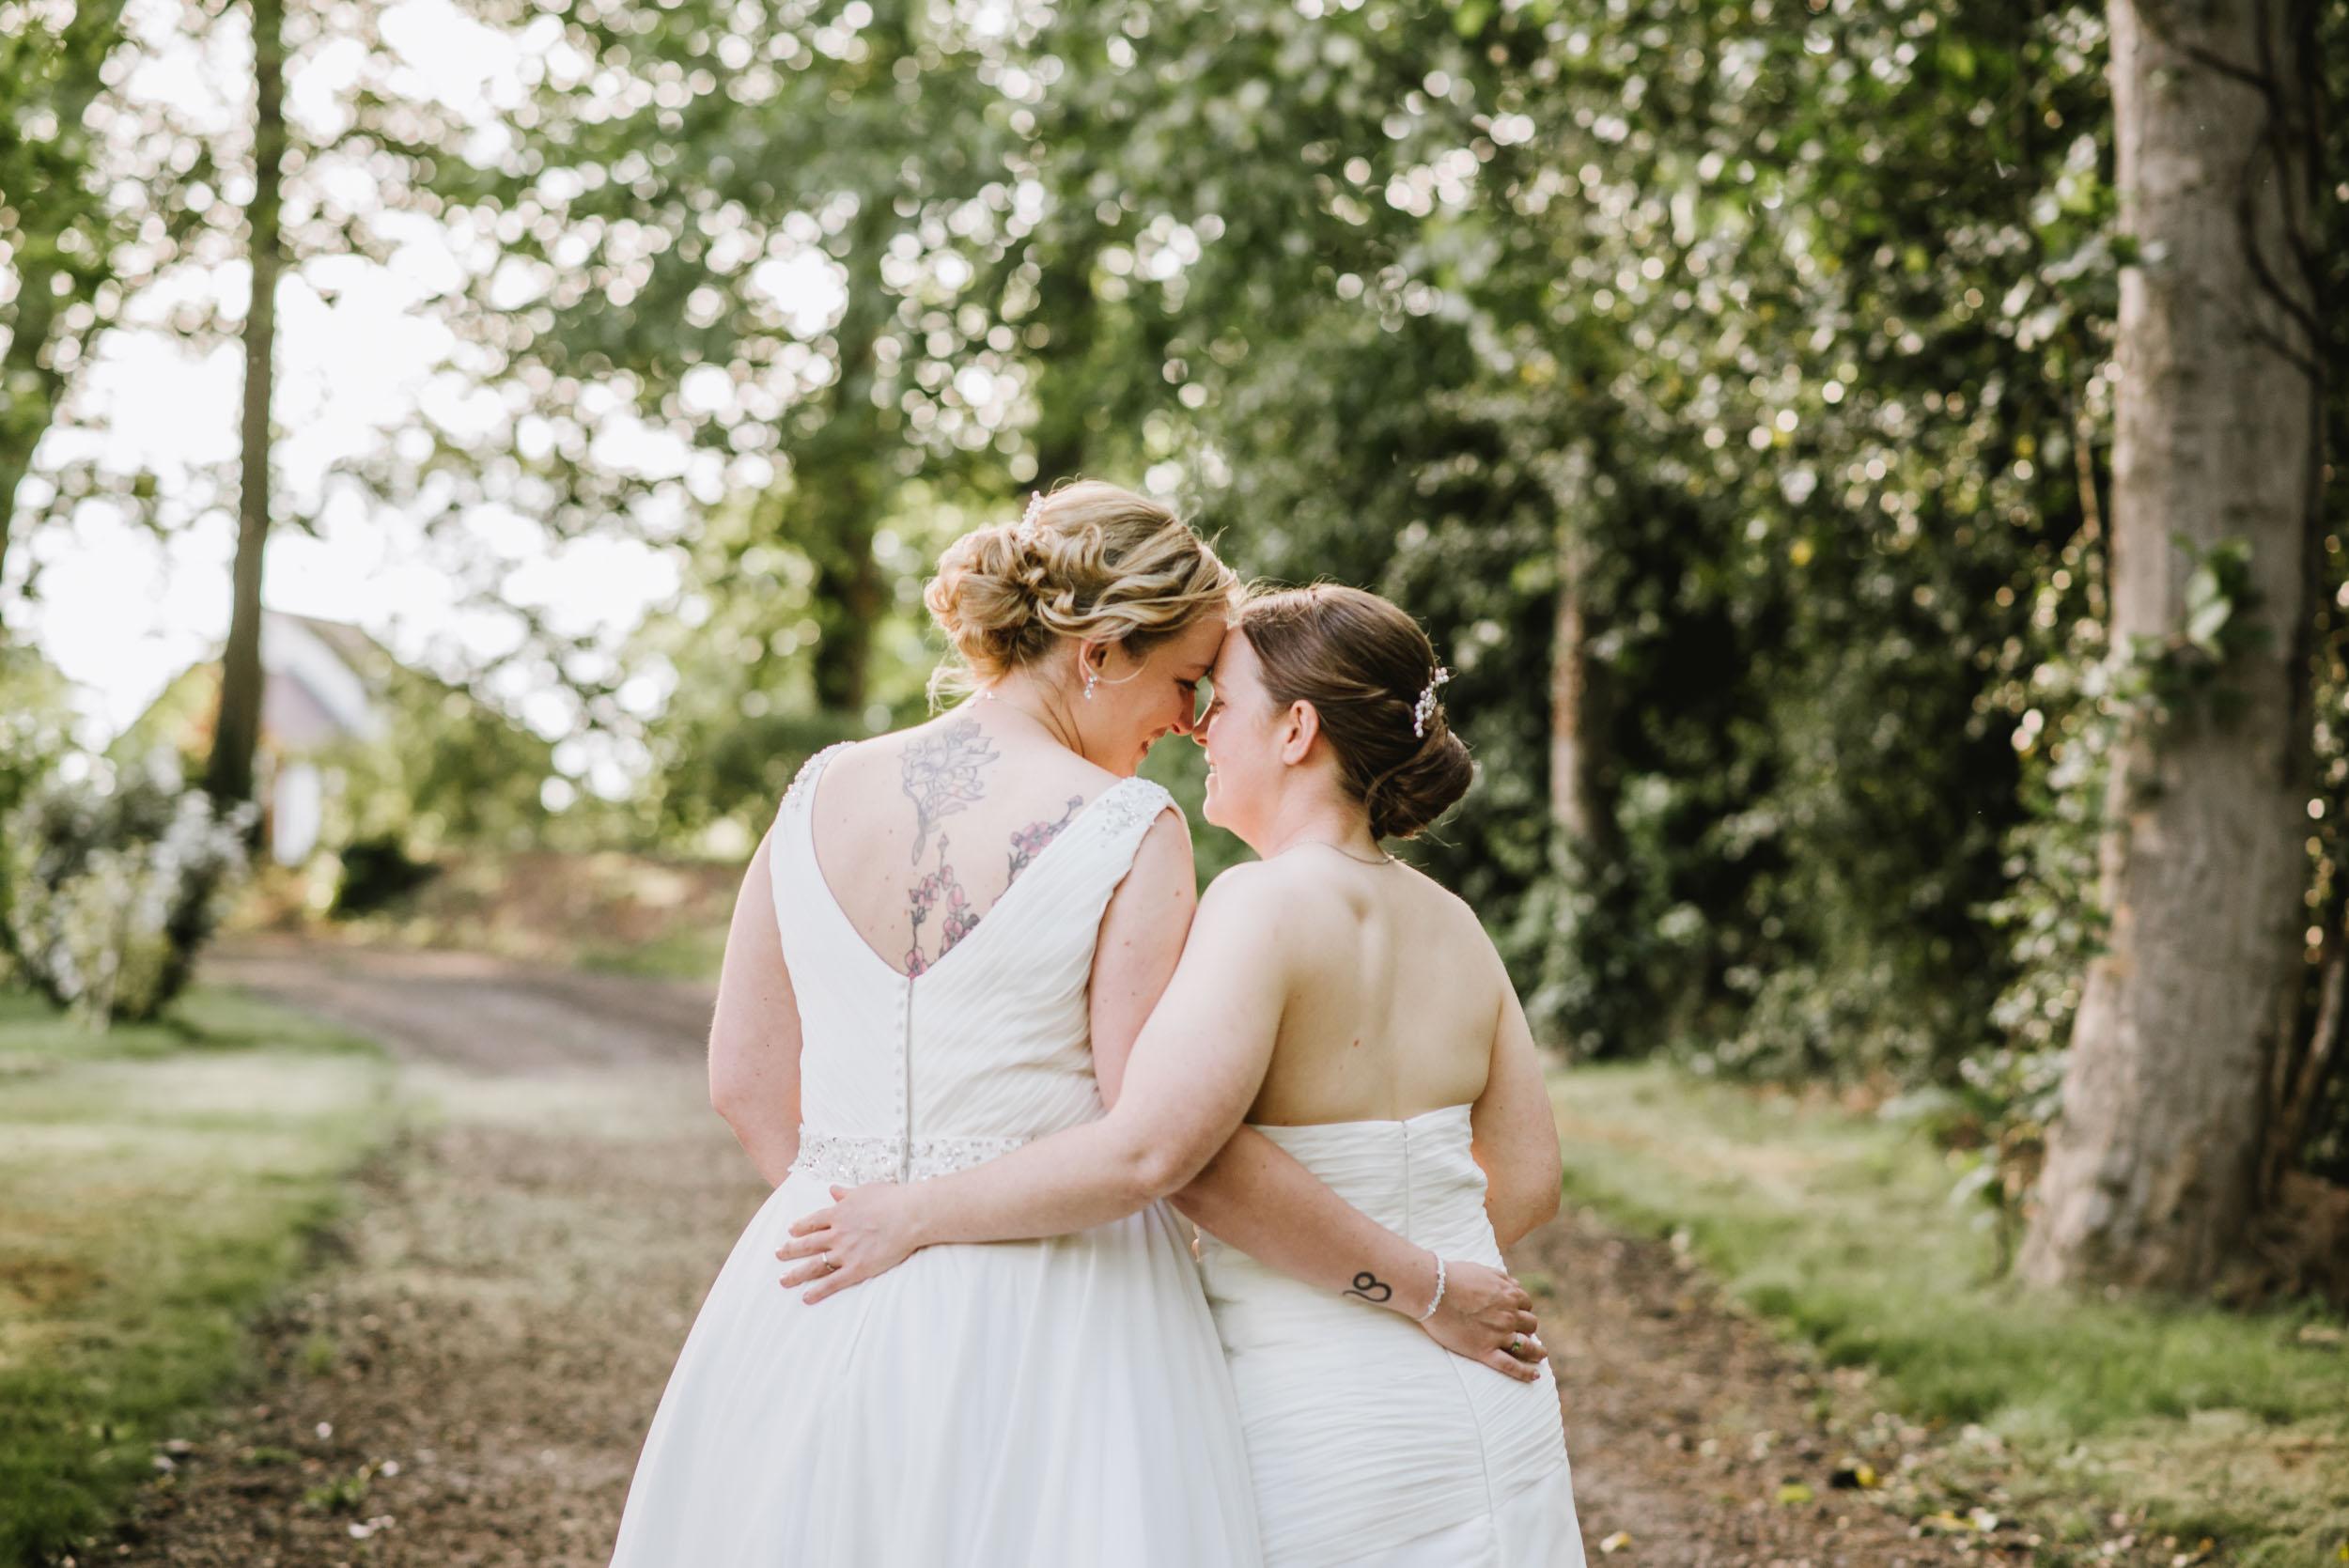 Donington-park-farm-wedding-photography-555.jpg